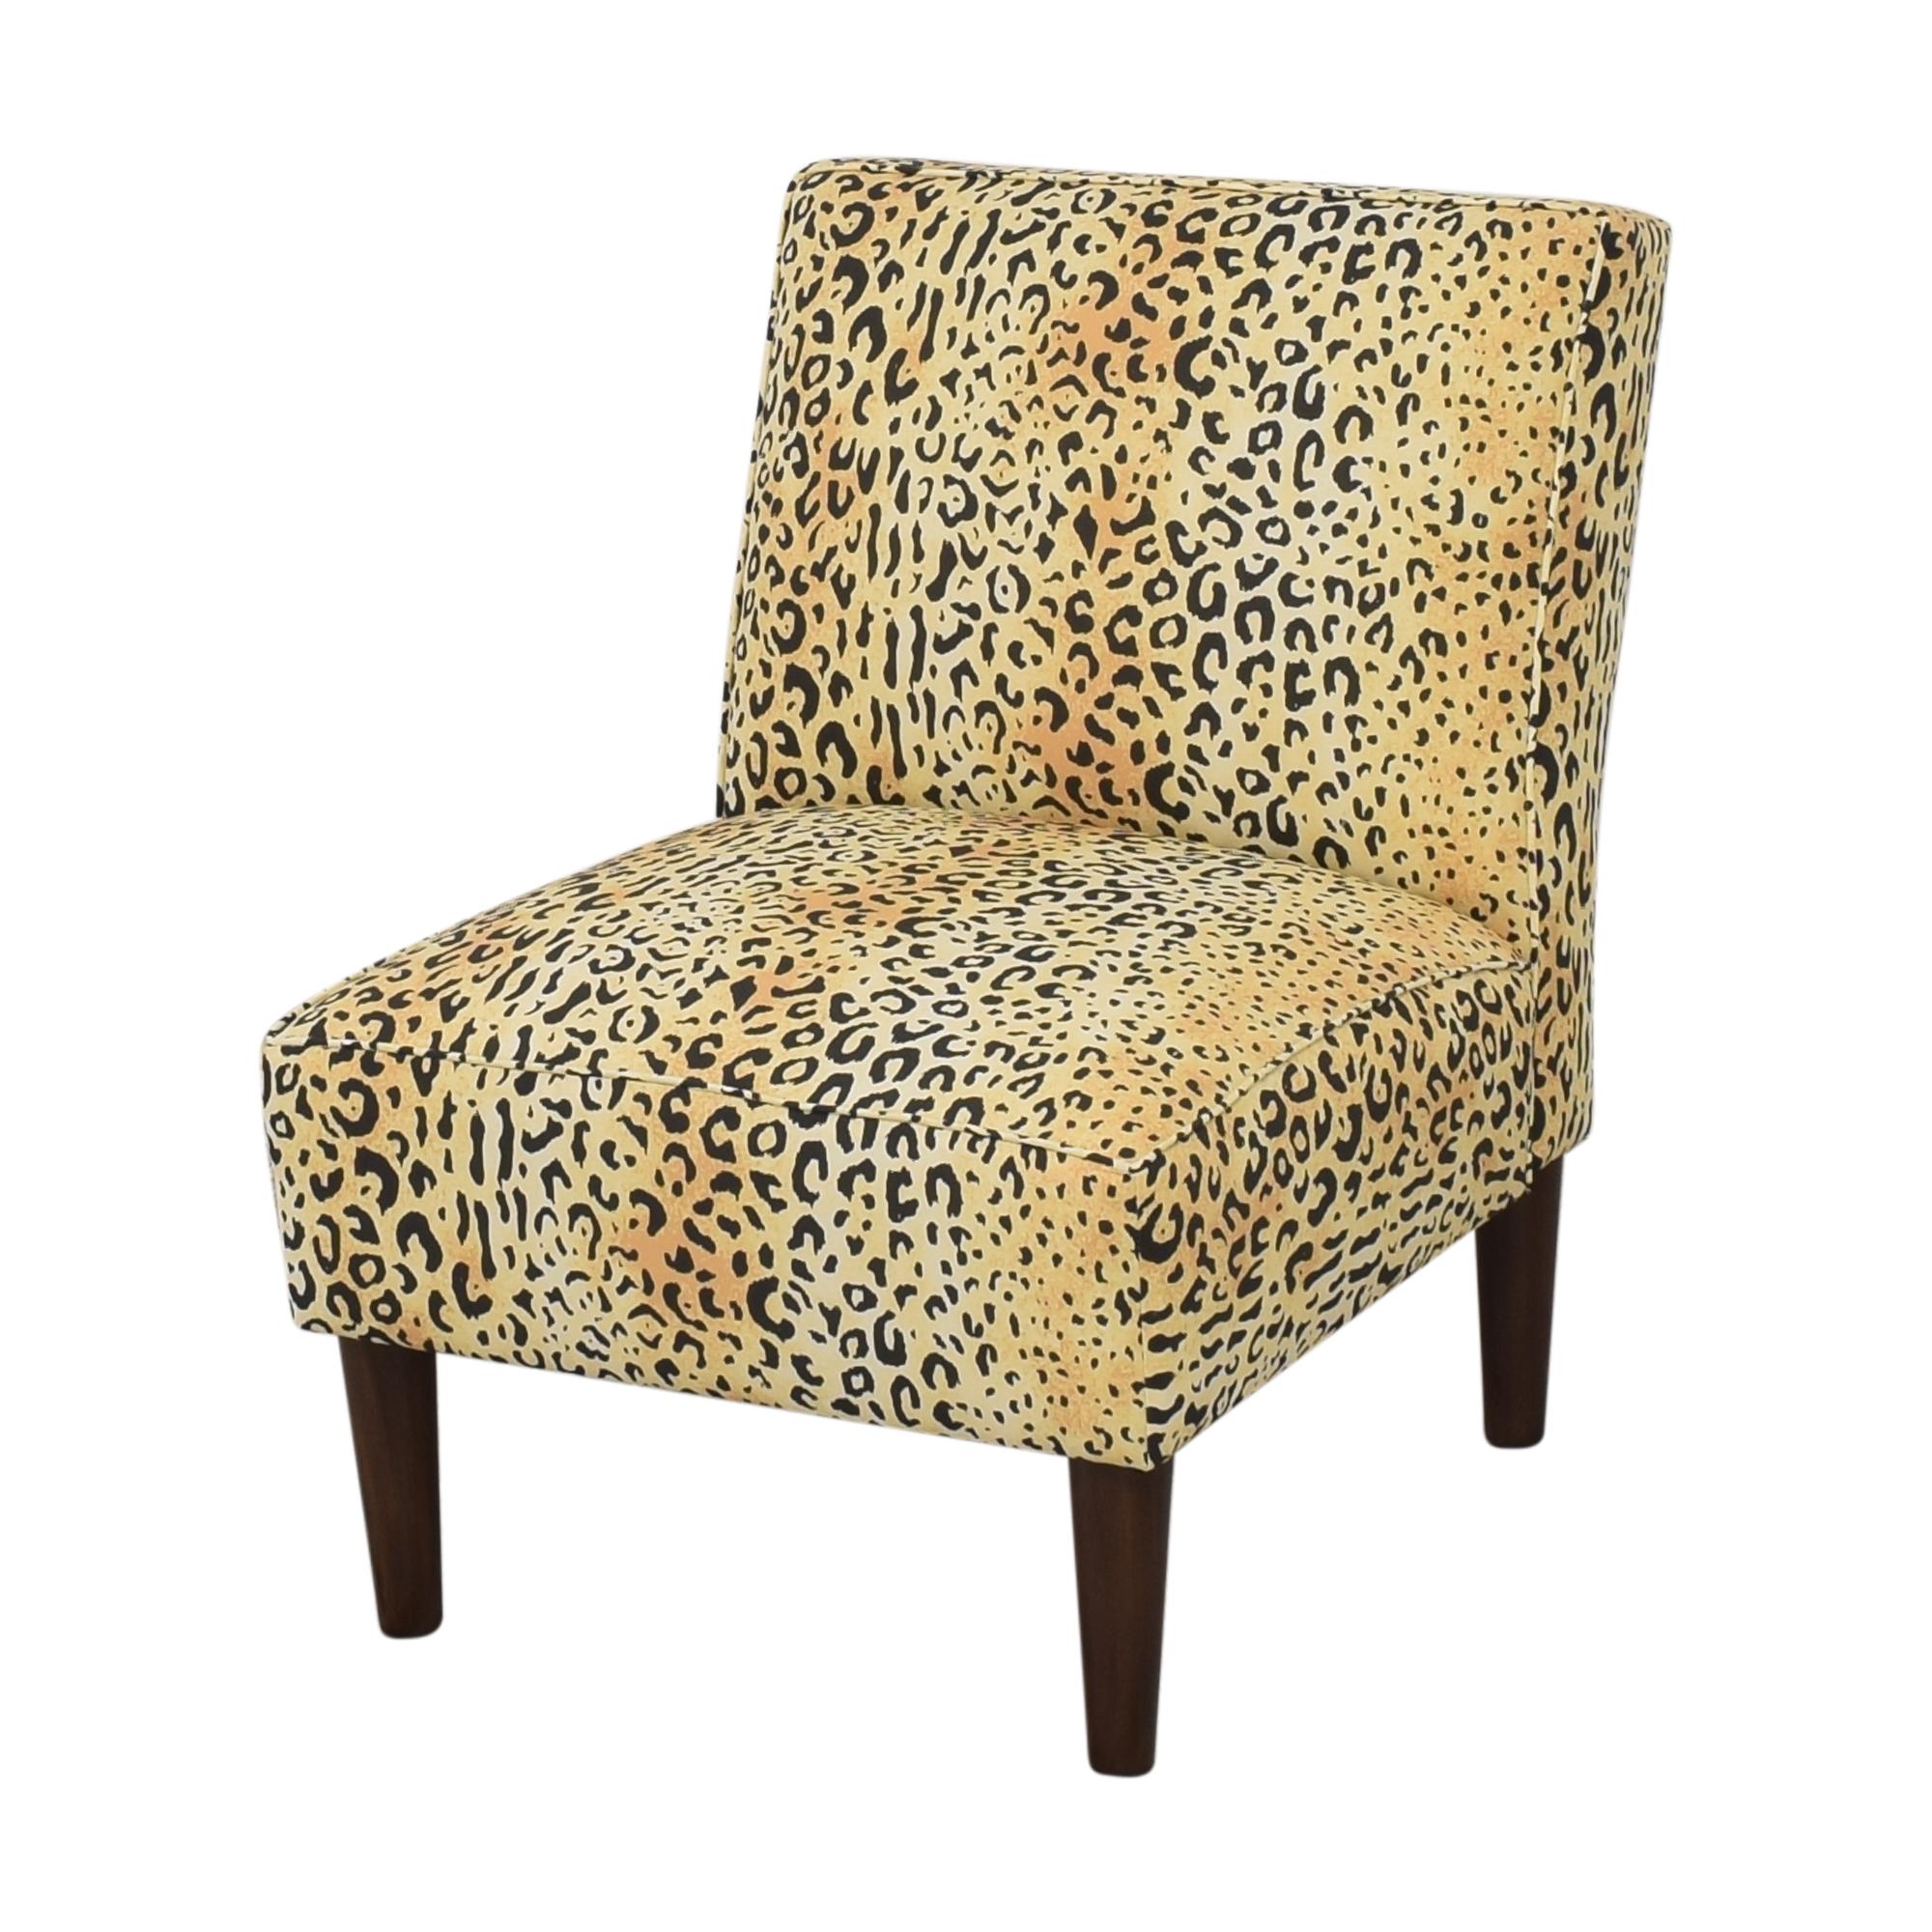 shop The Inside The Inside Slipper Chair online